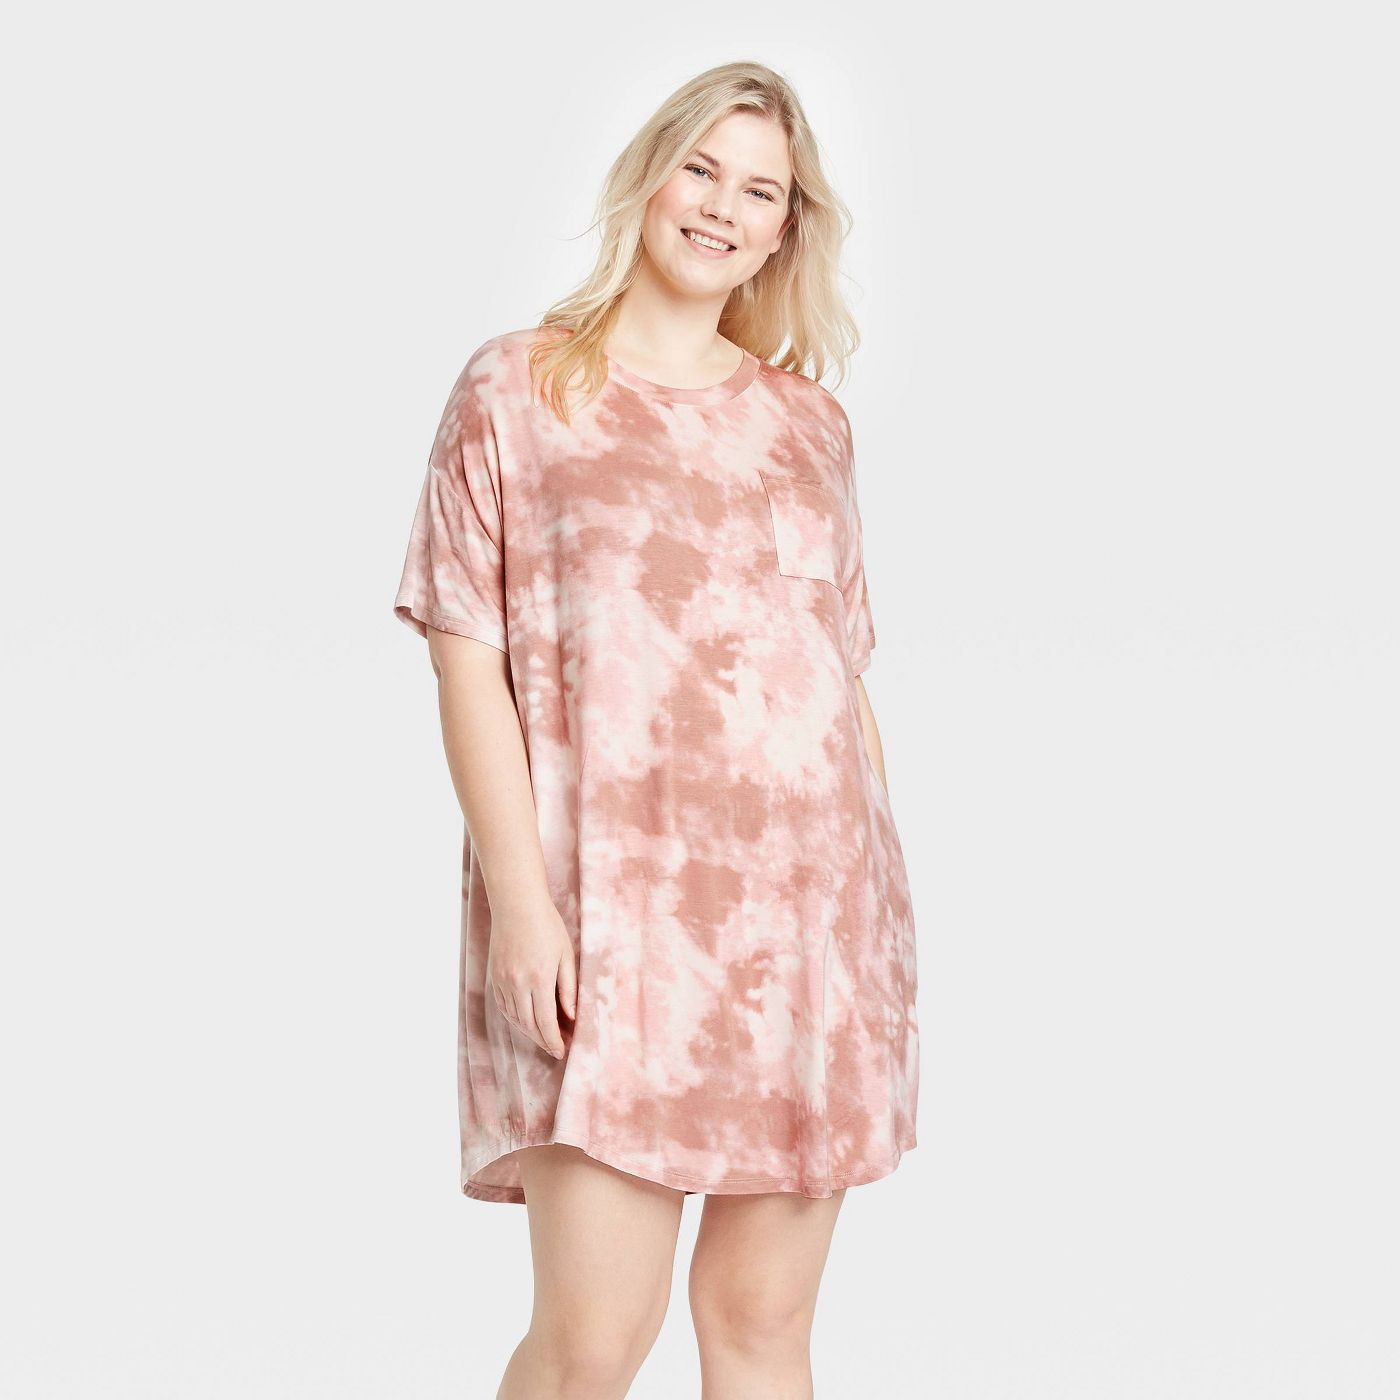 Women's Tie-Dye Short Sleeve Beautifully Soft Nightgown | Best Ever Plus Size Loungewear For Short People